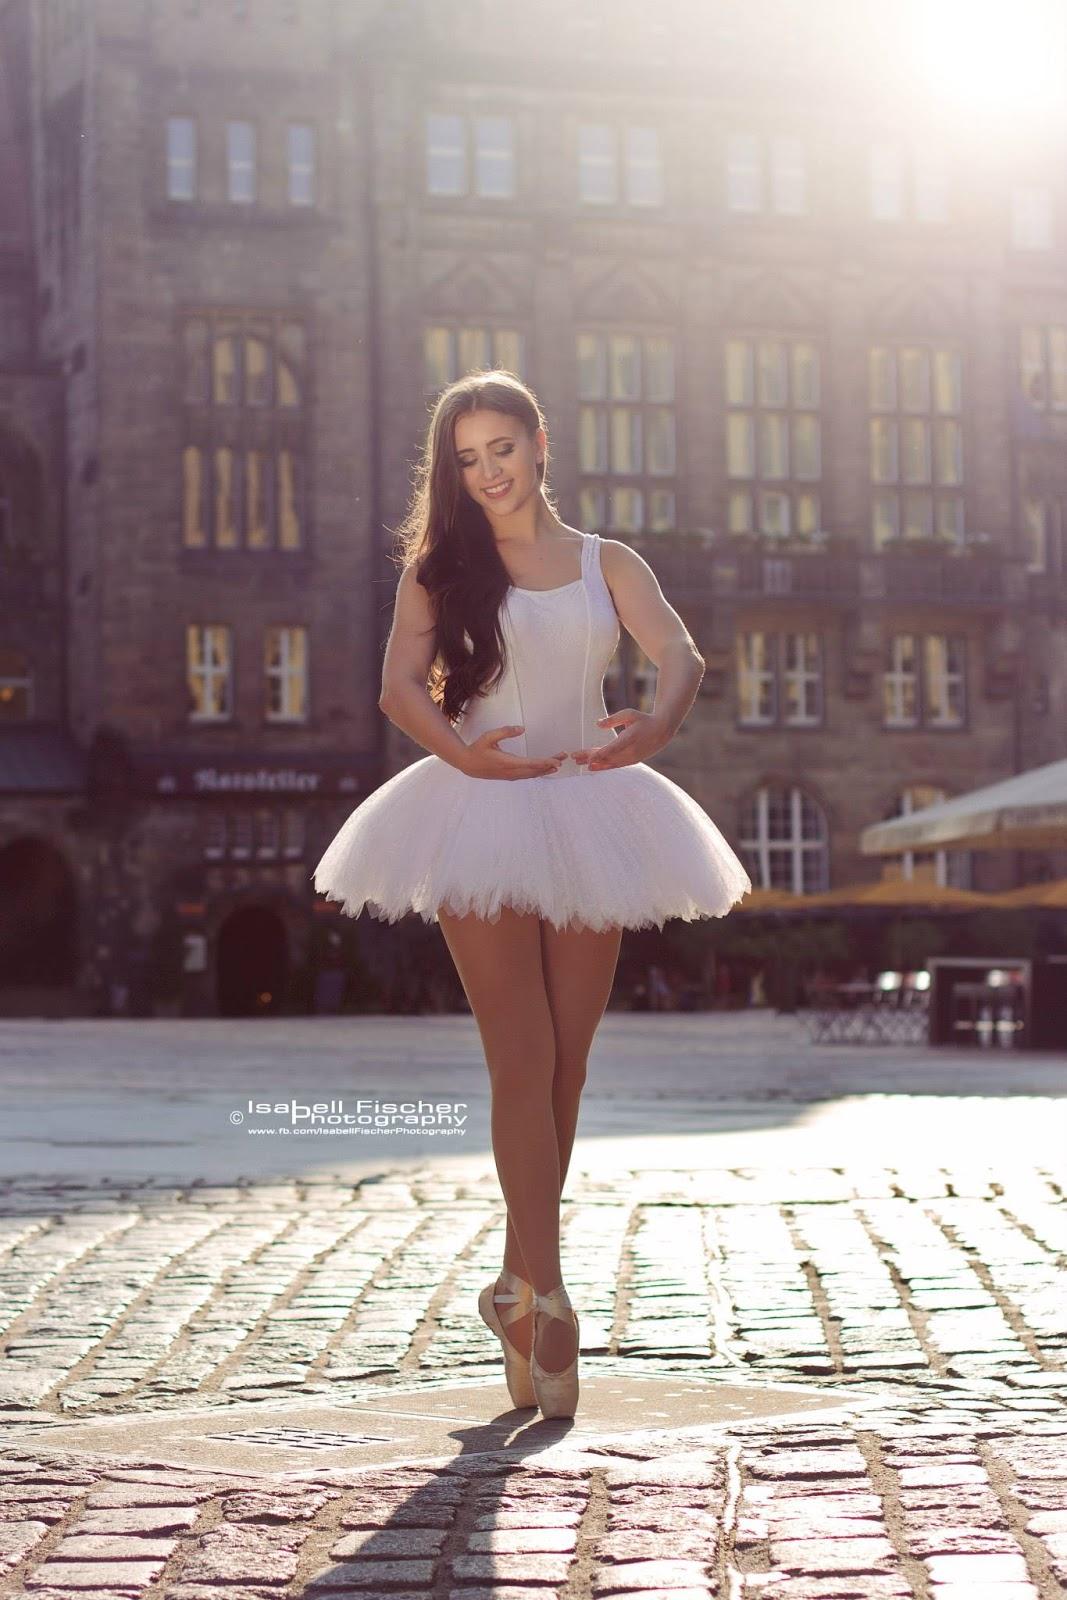 Ballerina on pointe with tutu